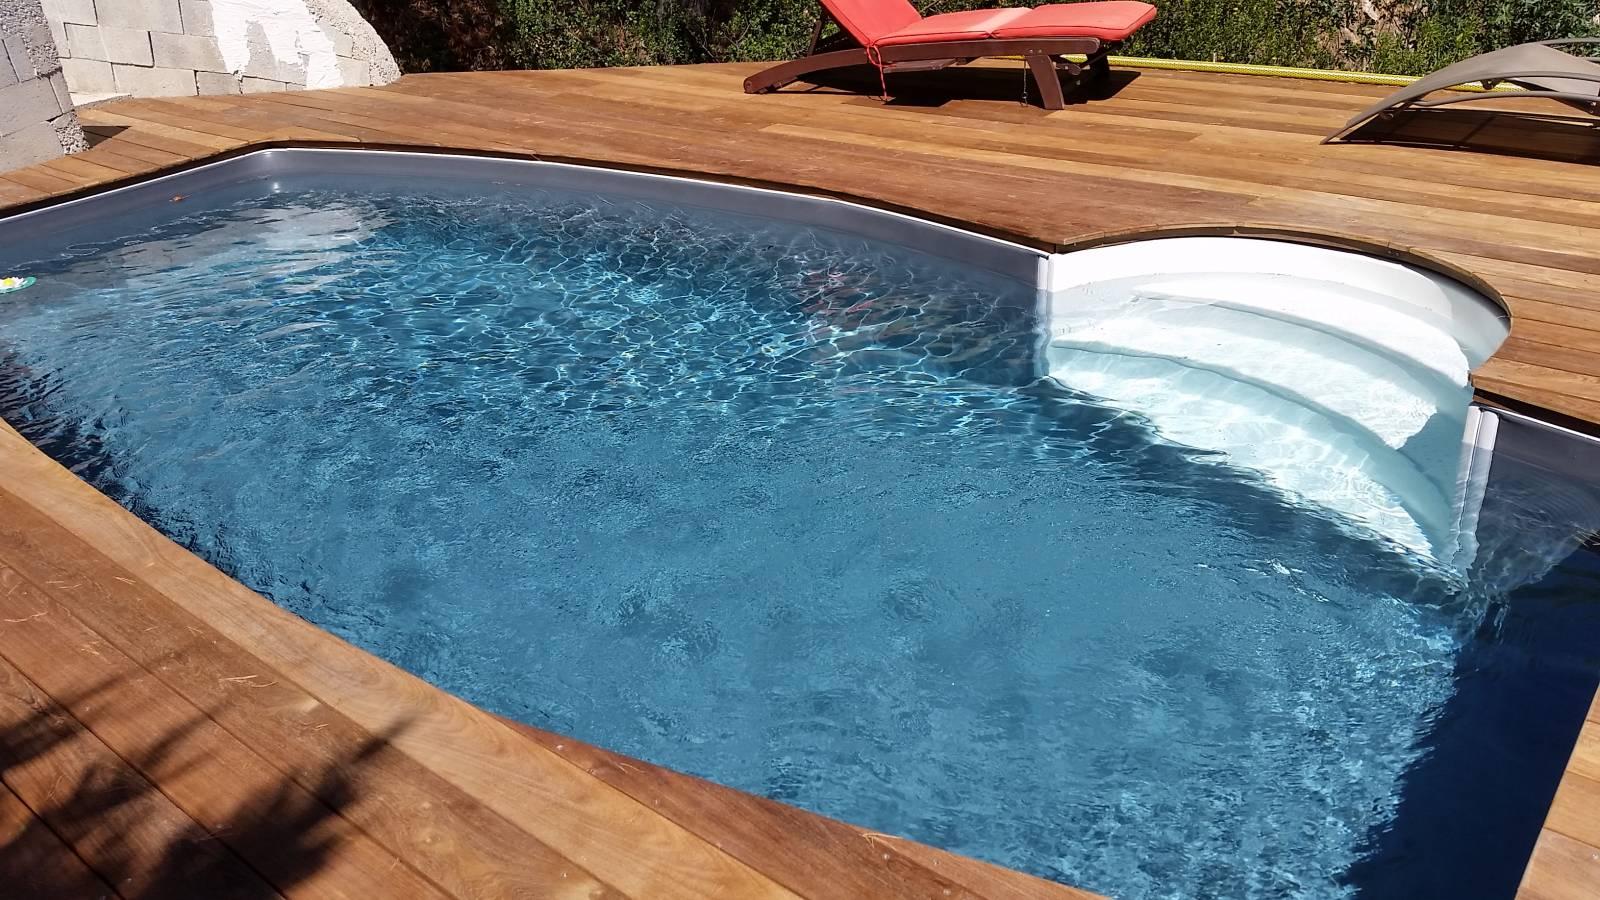 piscine ovo des 6x3 m gris anthracite et blanc jce piscines. Black Bedroom Furniture Sets. Home Design Ideas